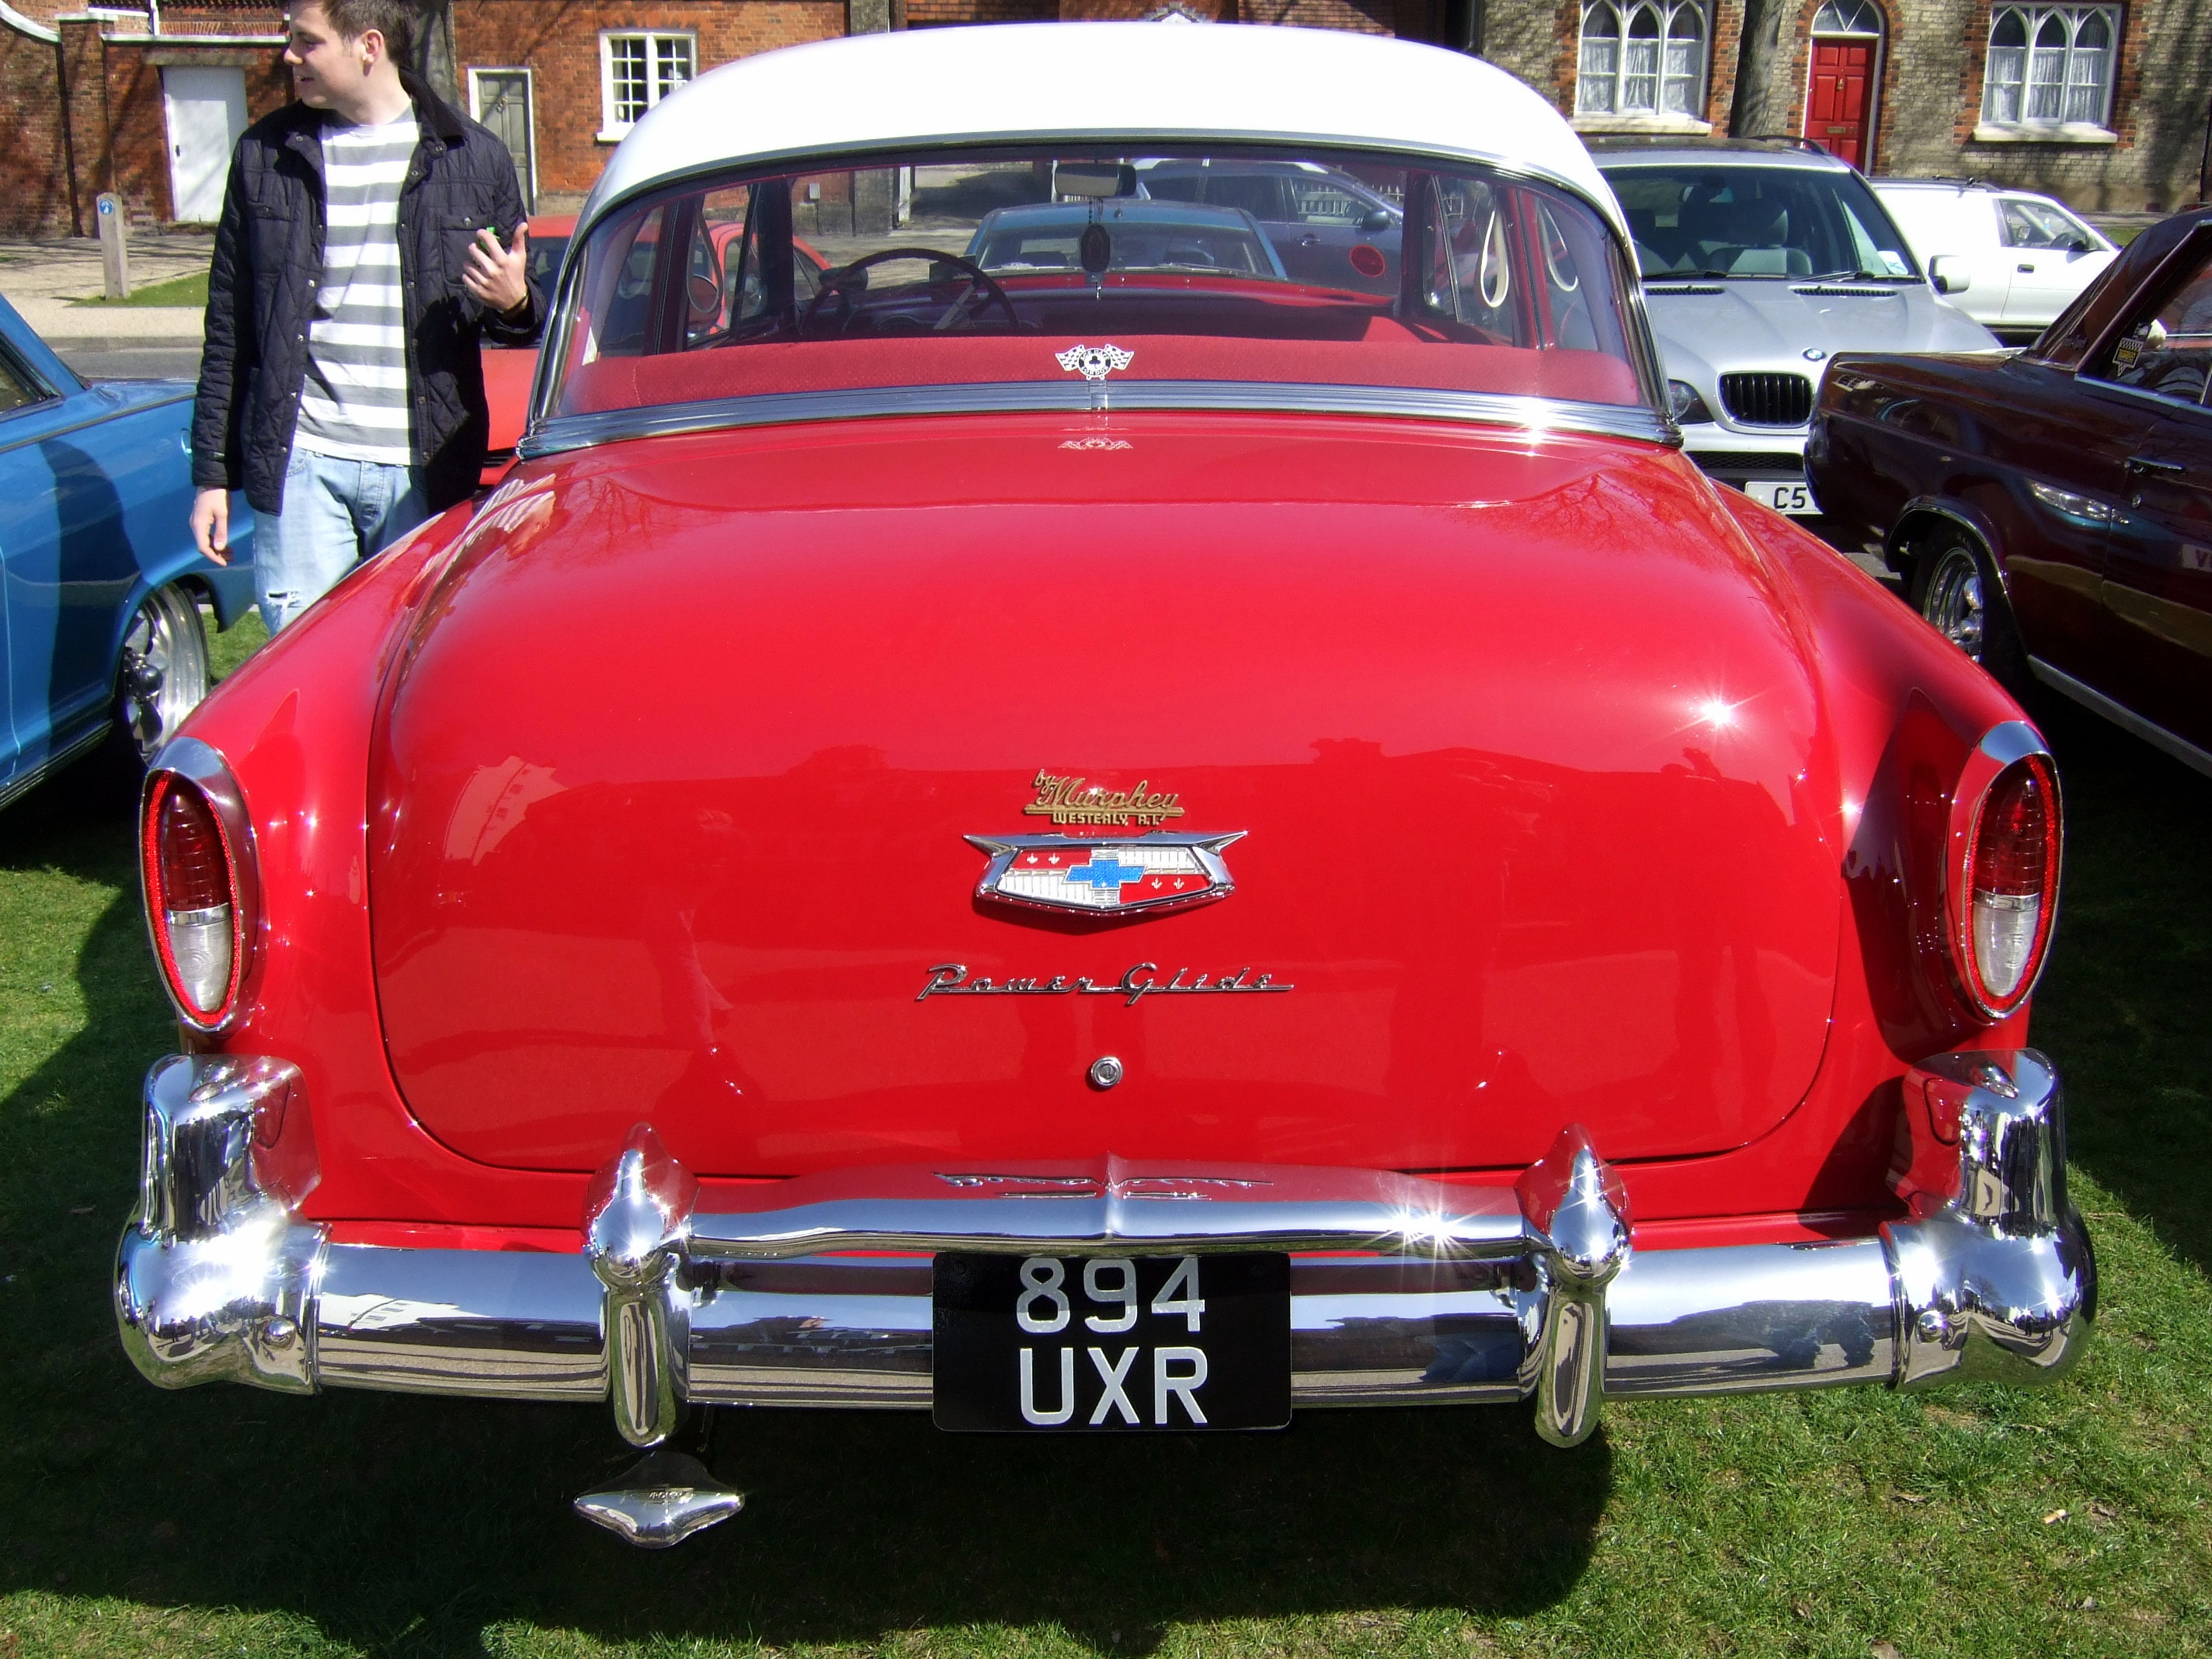 baldock high st car meet , Chevrolet, two ten by Sceptre63